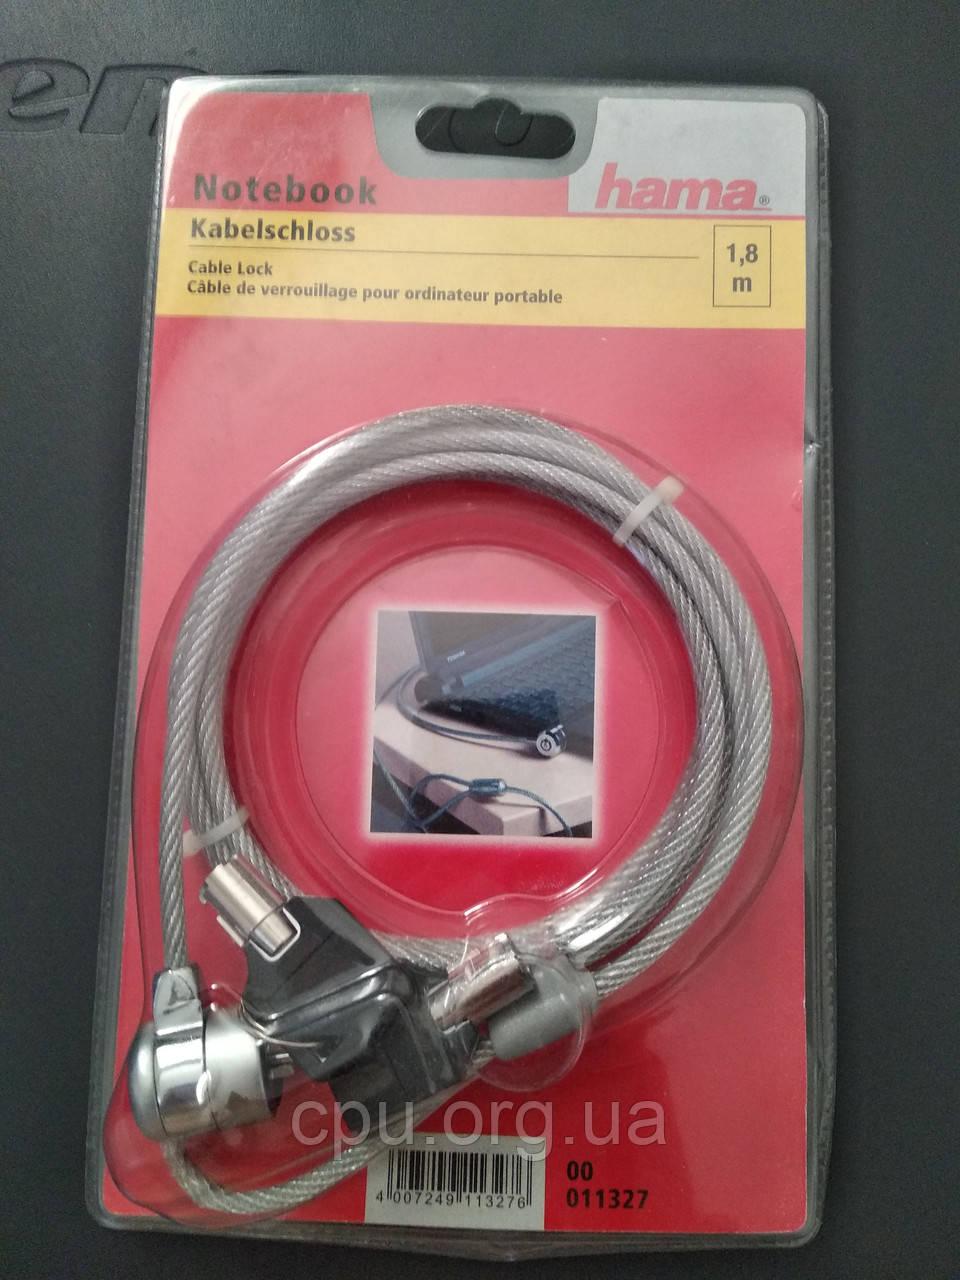 Kensington lock трос/замок для ноутбука/ПК/монитора